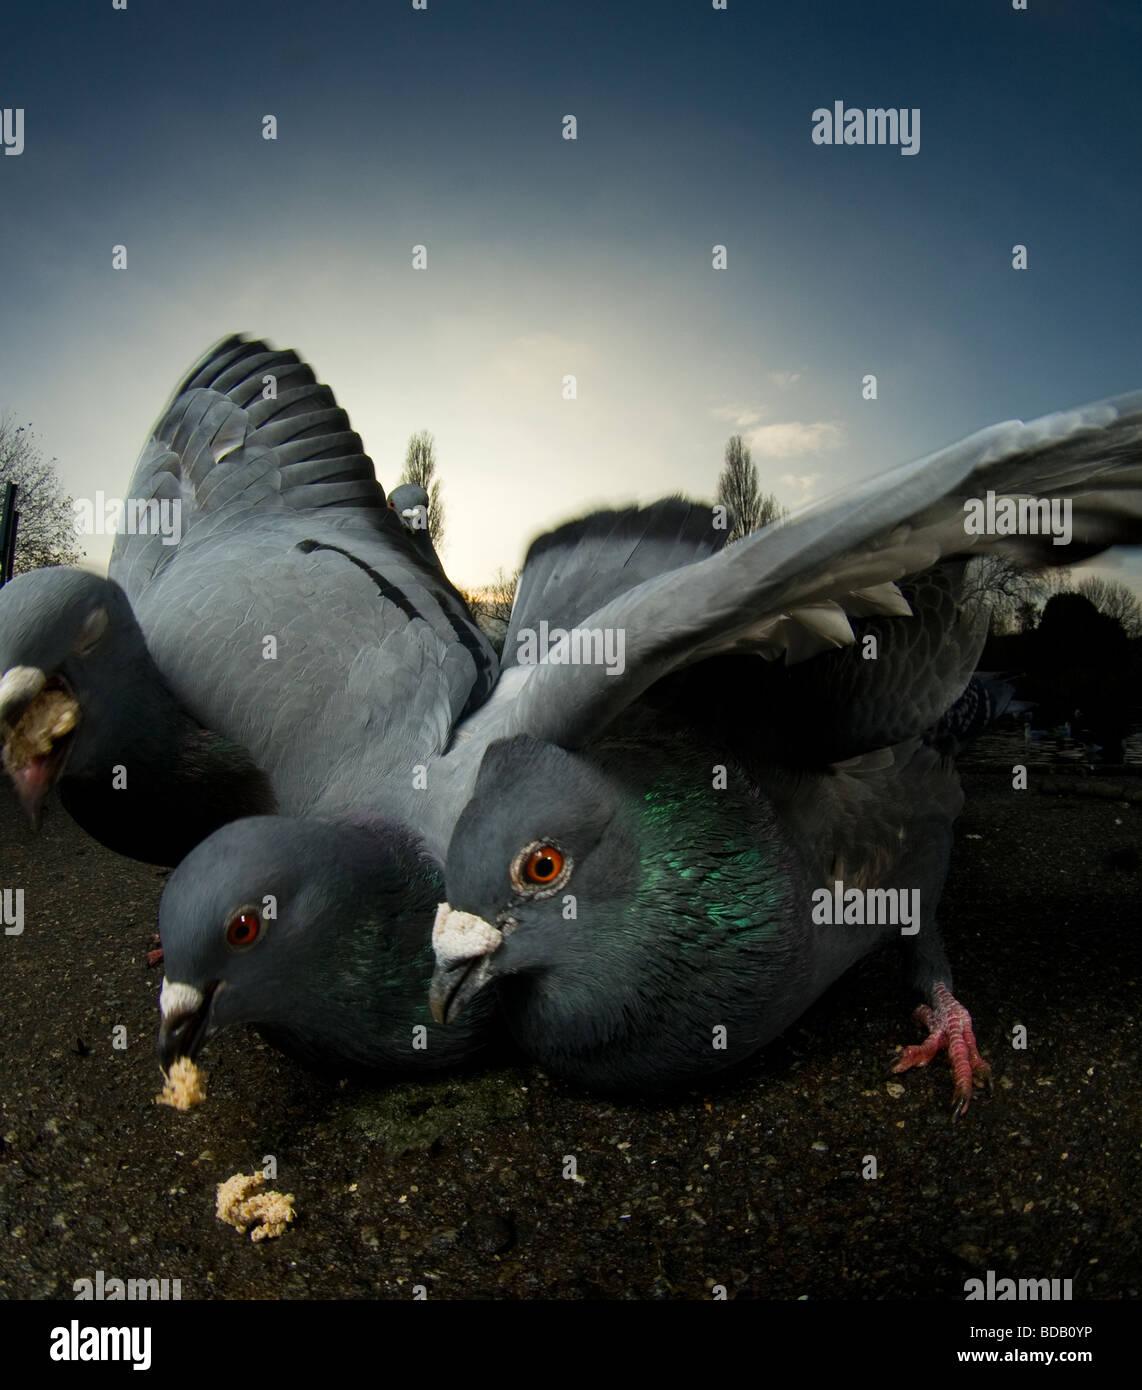 Palomas lunging para alimentos, Londres Imagen De Stock